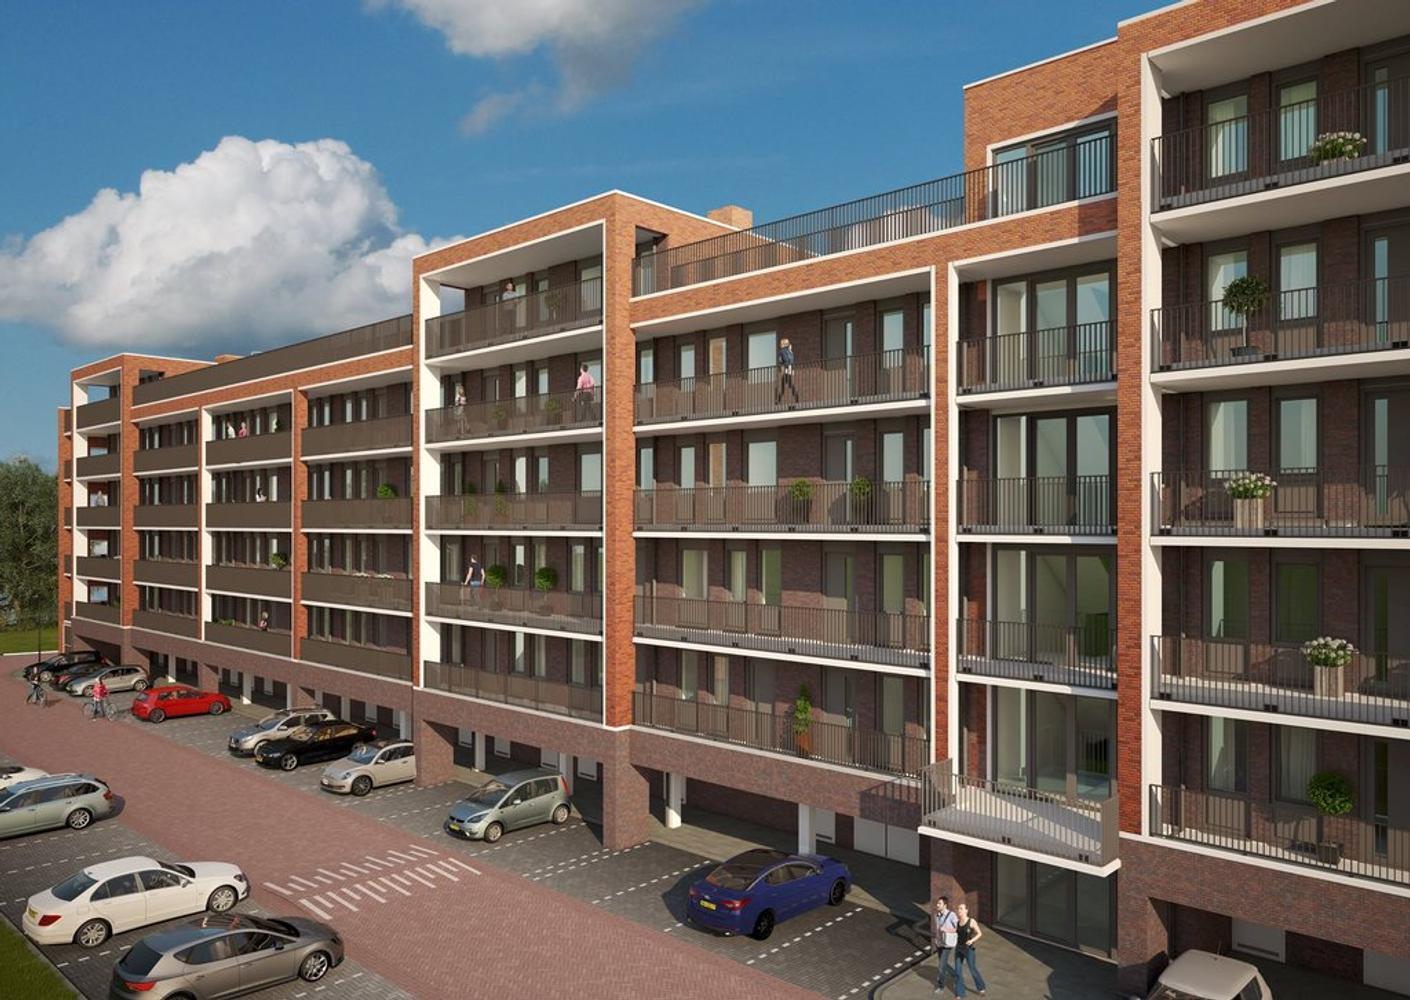 1E Melmseweg 39 in Veenendaal 3905 MA: Appartement. - Diepeveen ...